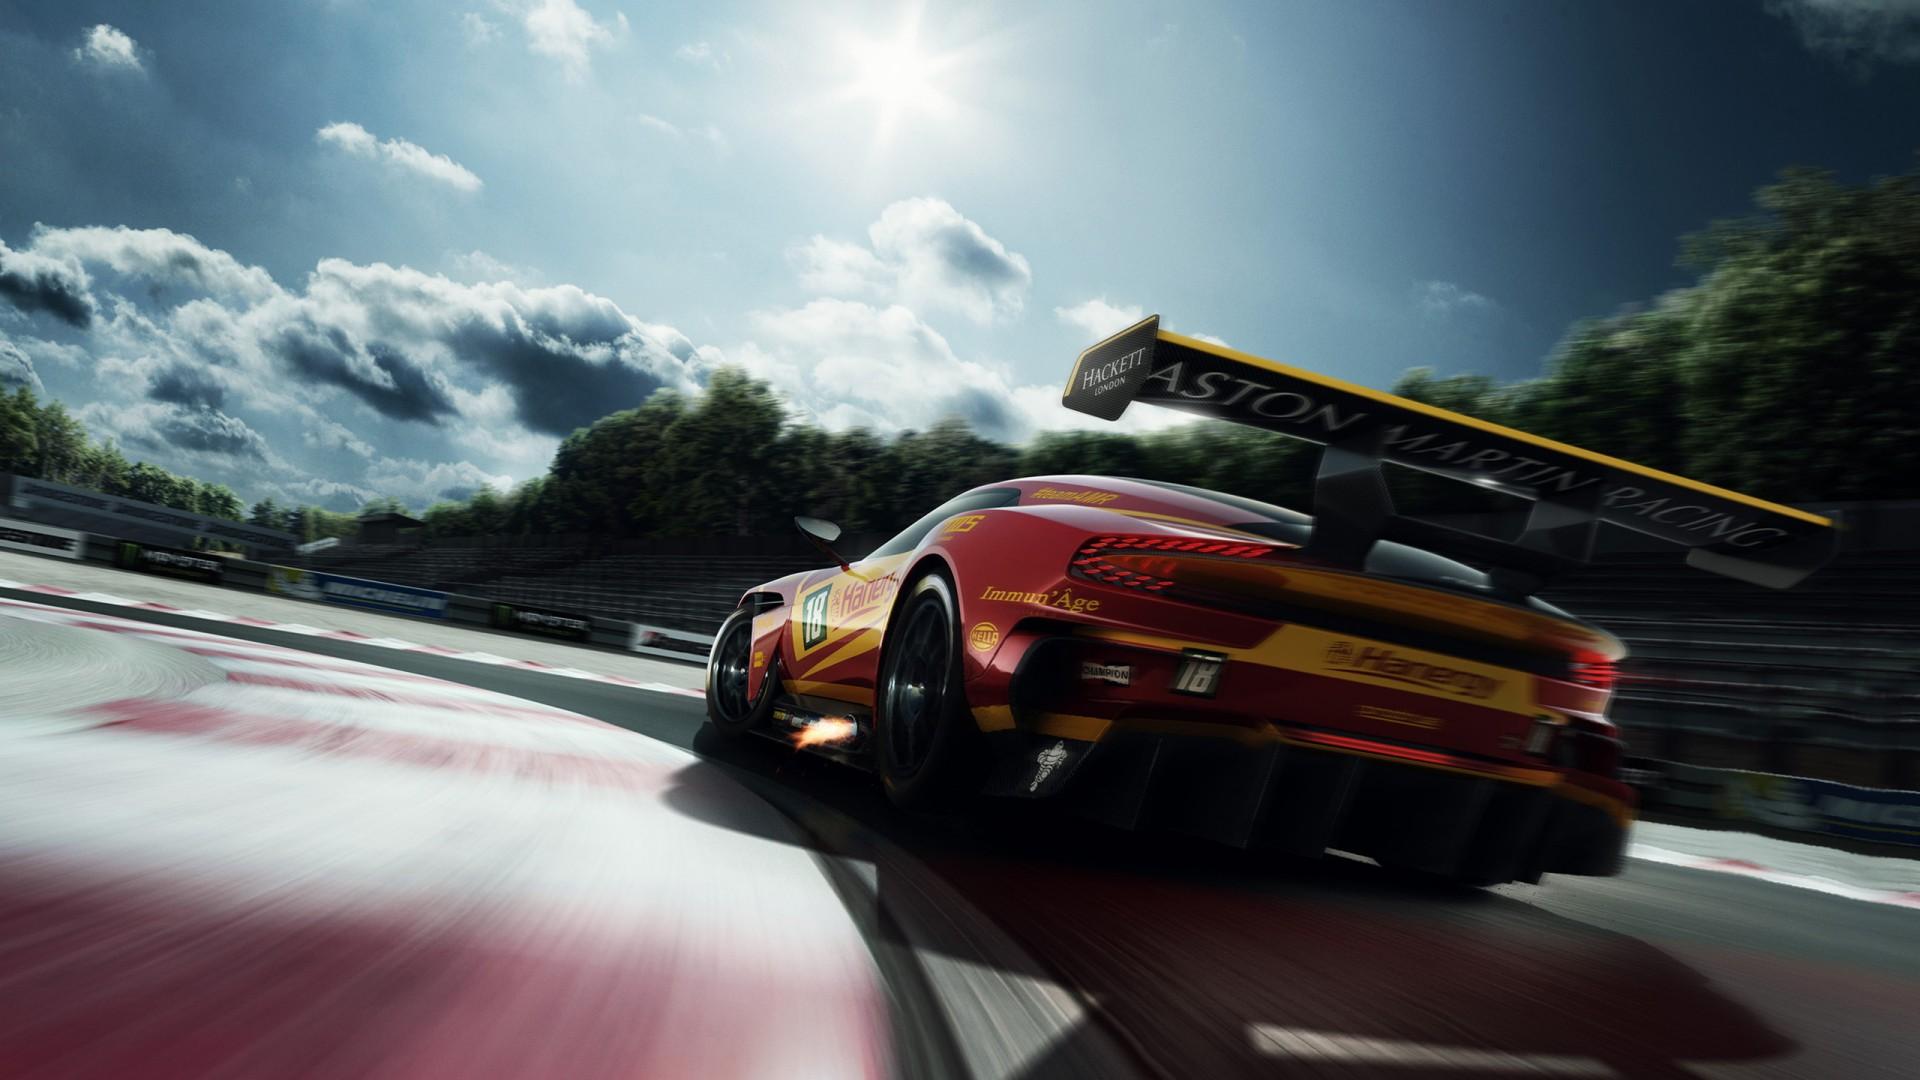 Aston Martin Vulcan Racing Hd Wallpaper Hd Car